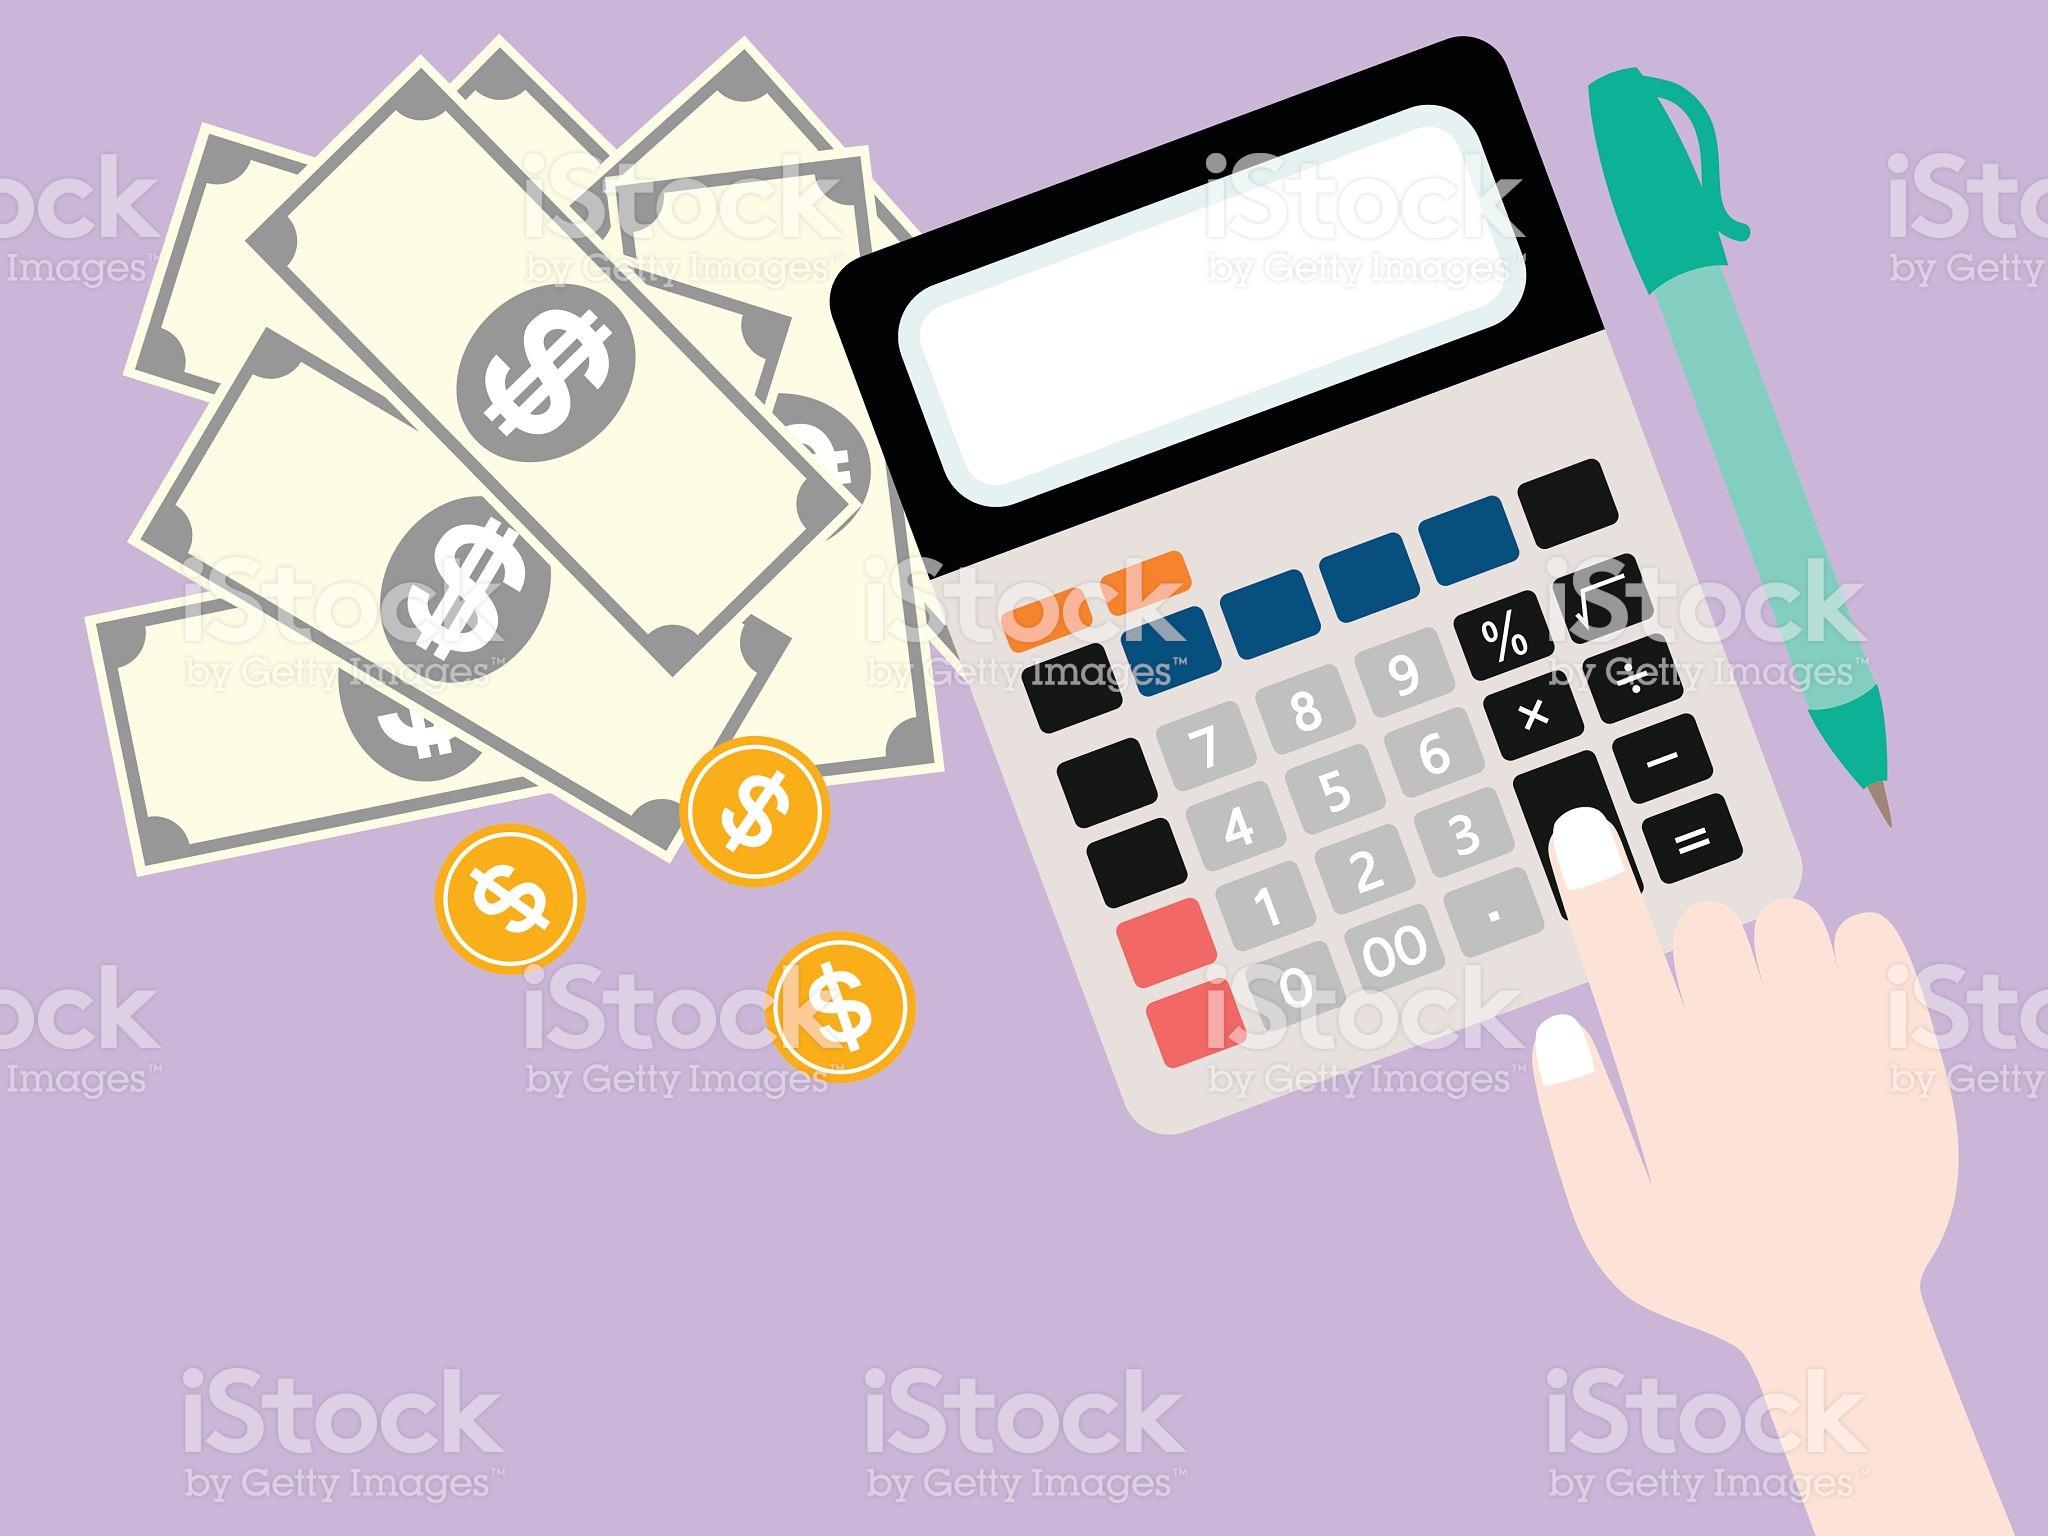 Retail Skill Calculation - istockphoto.com